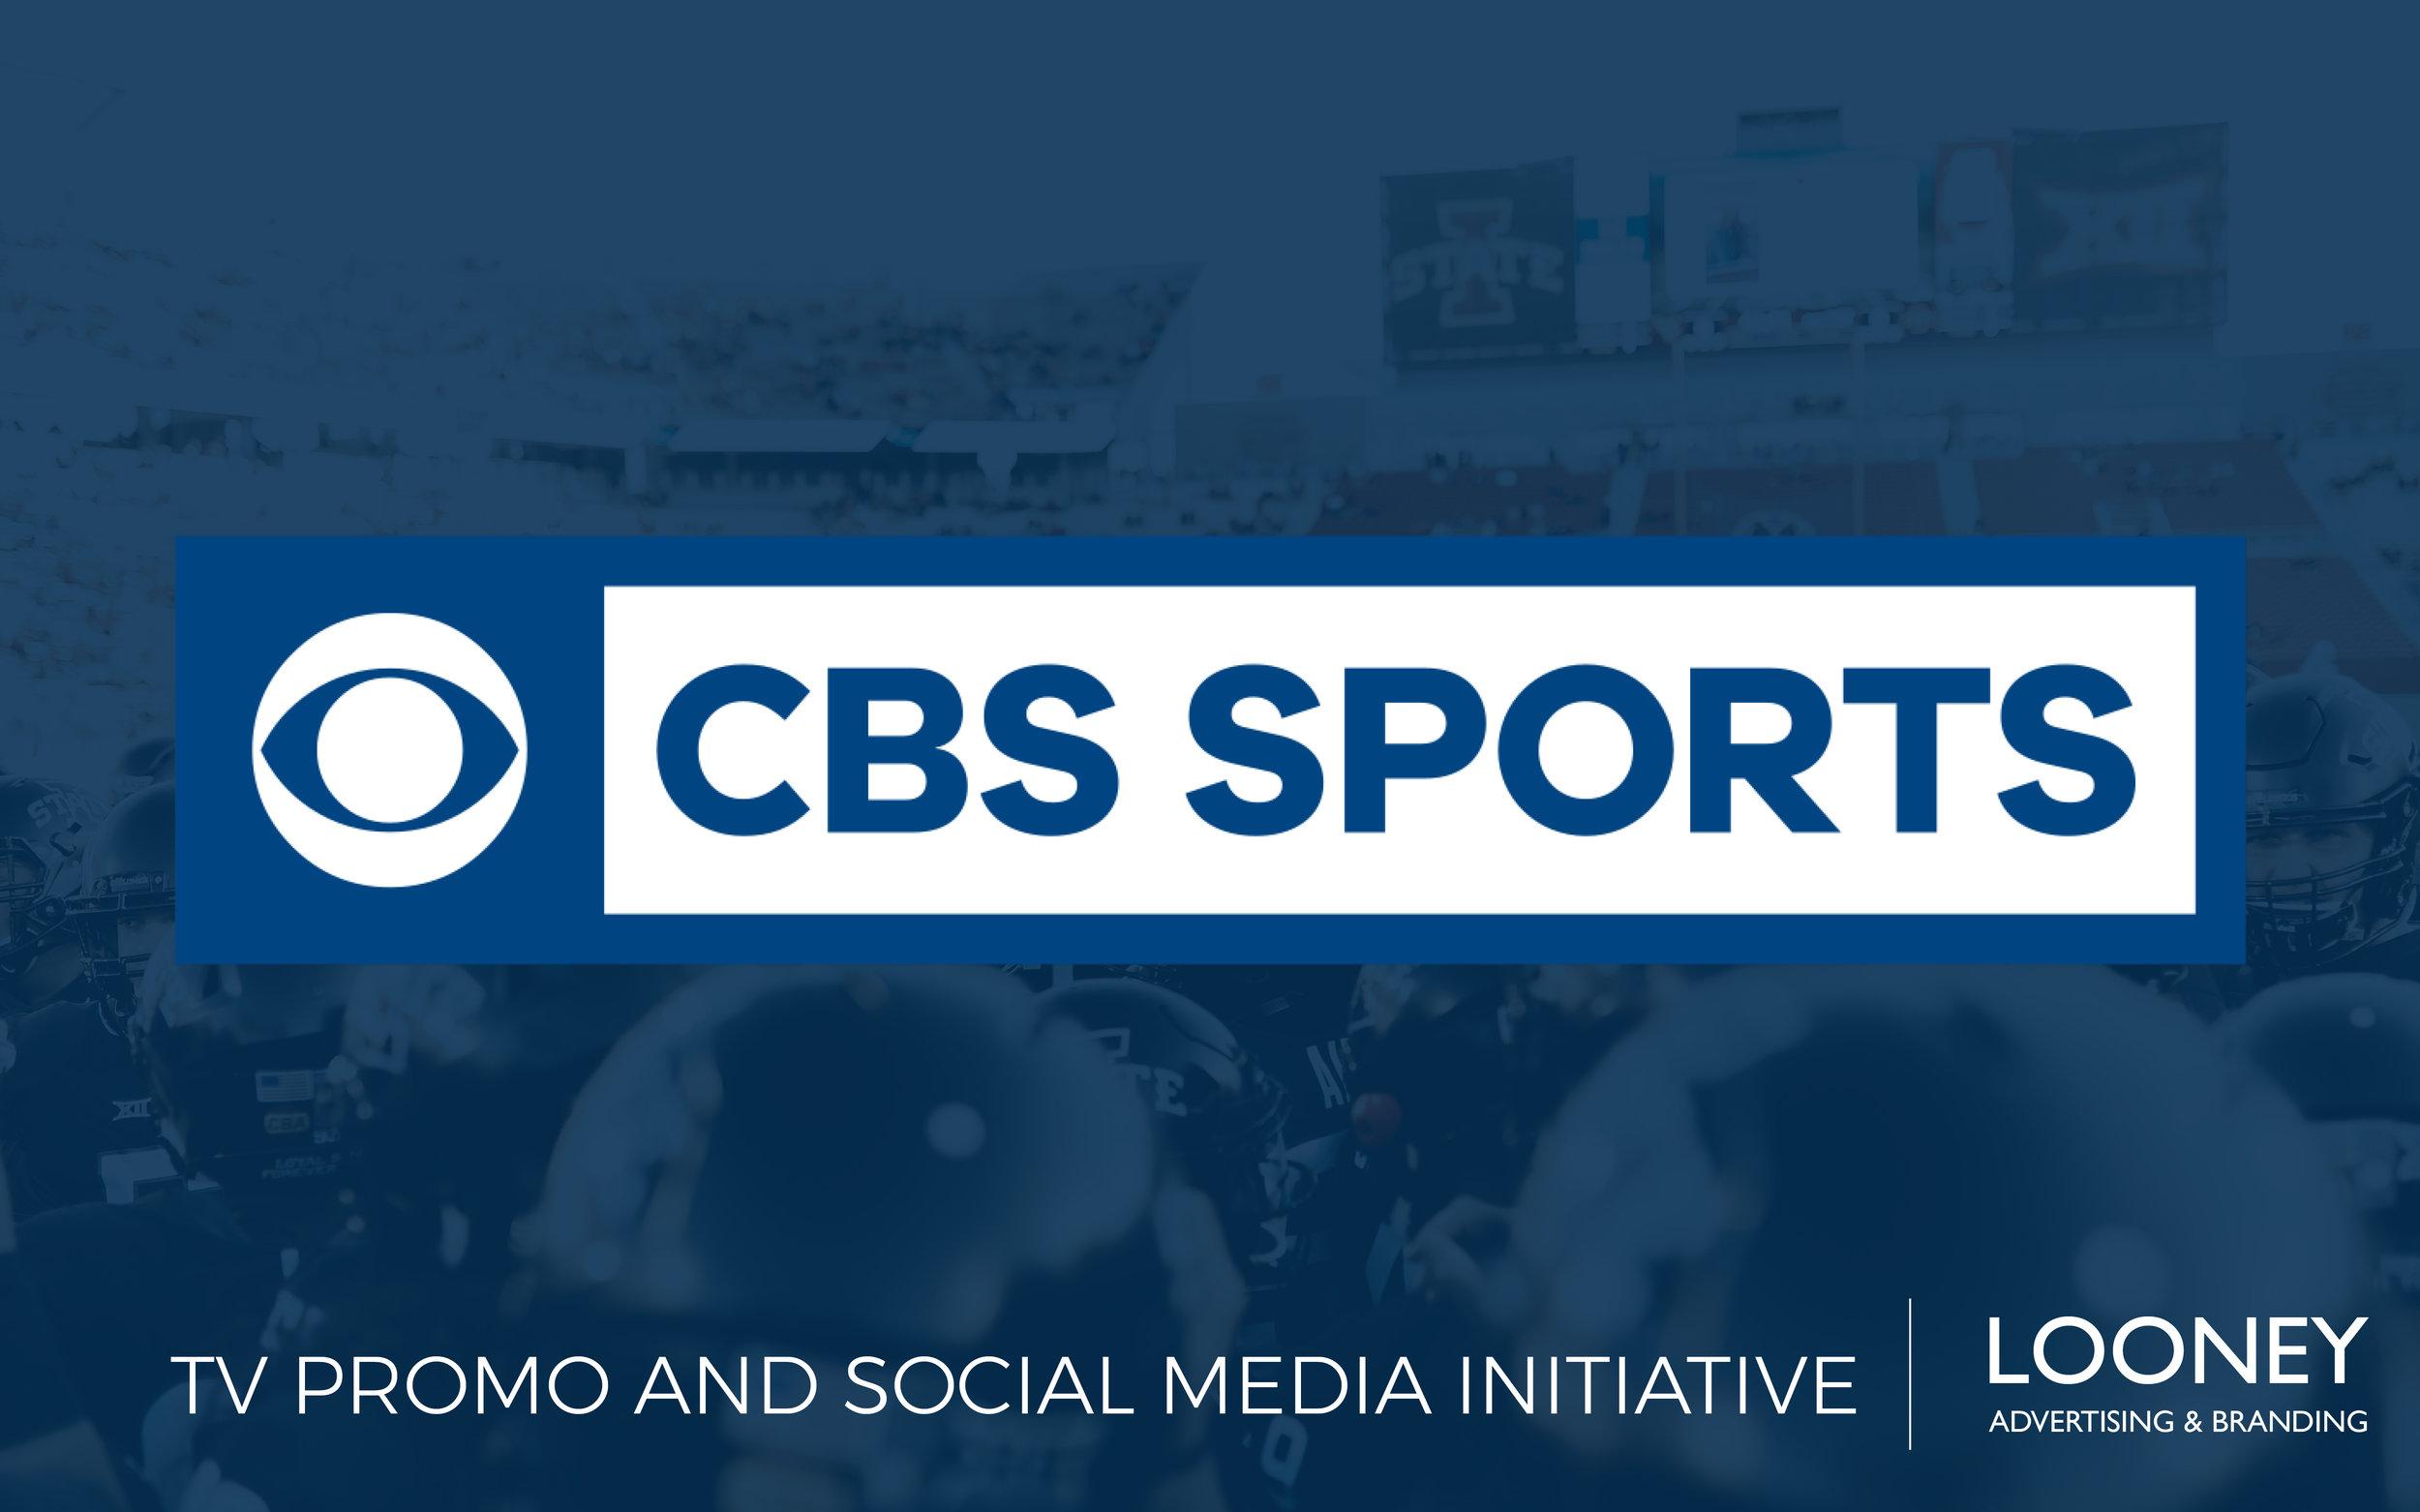 CBSSportsDeck.jpg